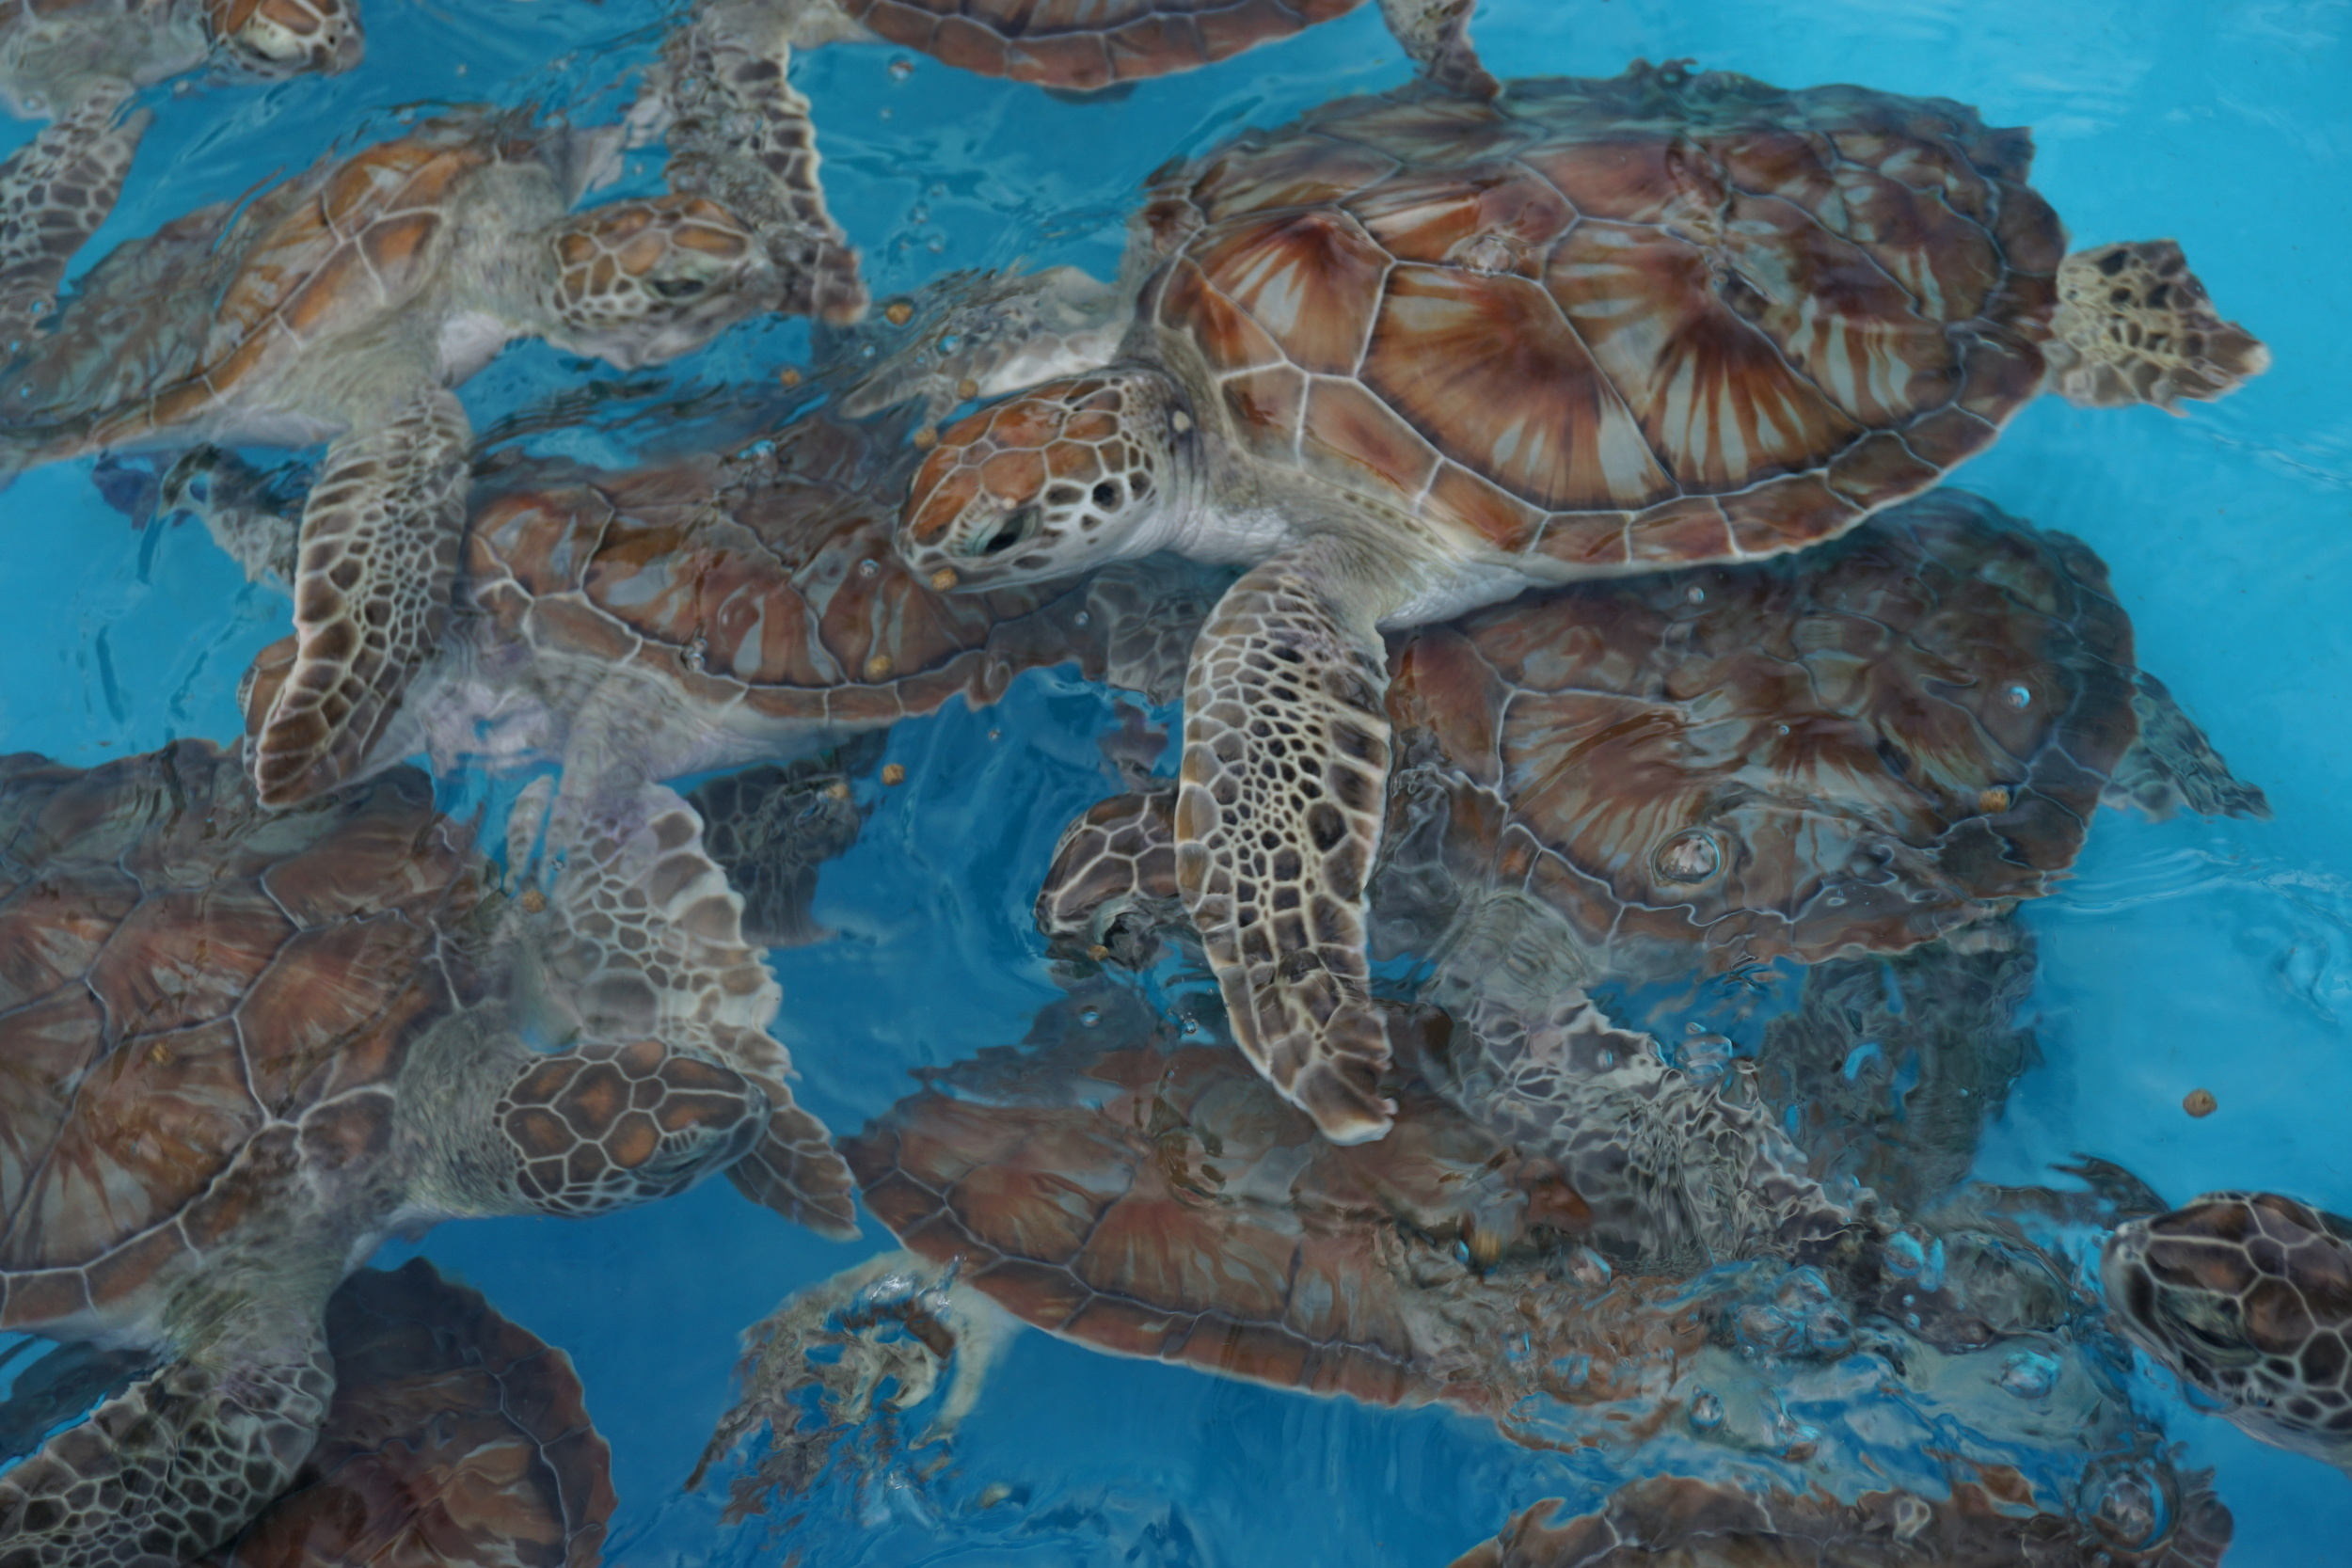 Juvenile sea turtles at the Cayo Largo Center for Sea Turtle Rescue. Photo by Daniel Ward.